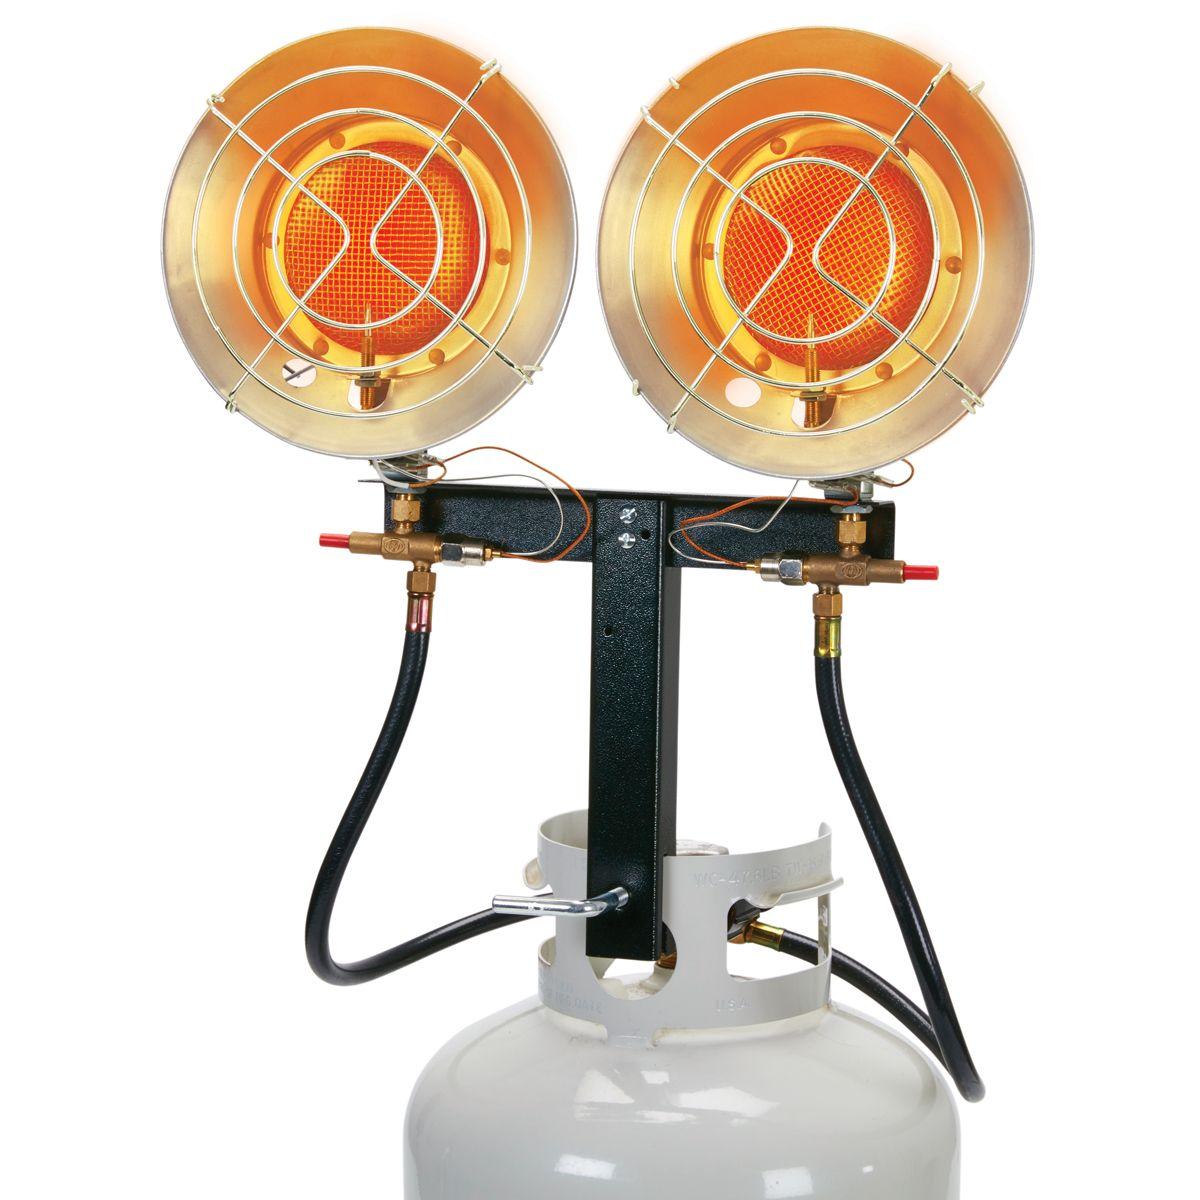 30 000 Btu Tank Top Propane Heater Patio Heater Propane Heater Outdoor Propane Heater